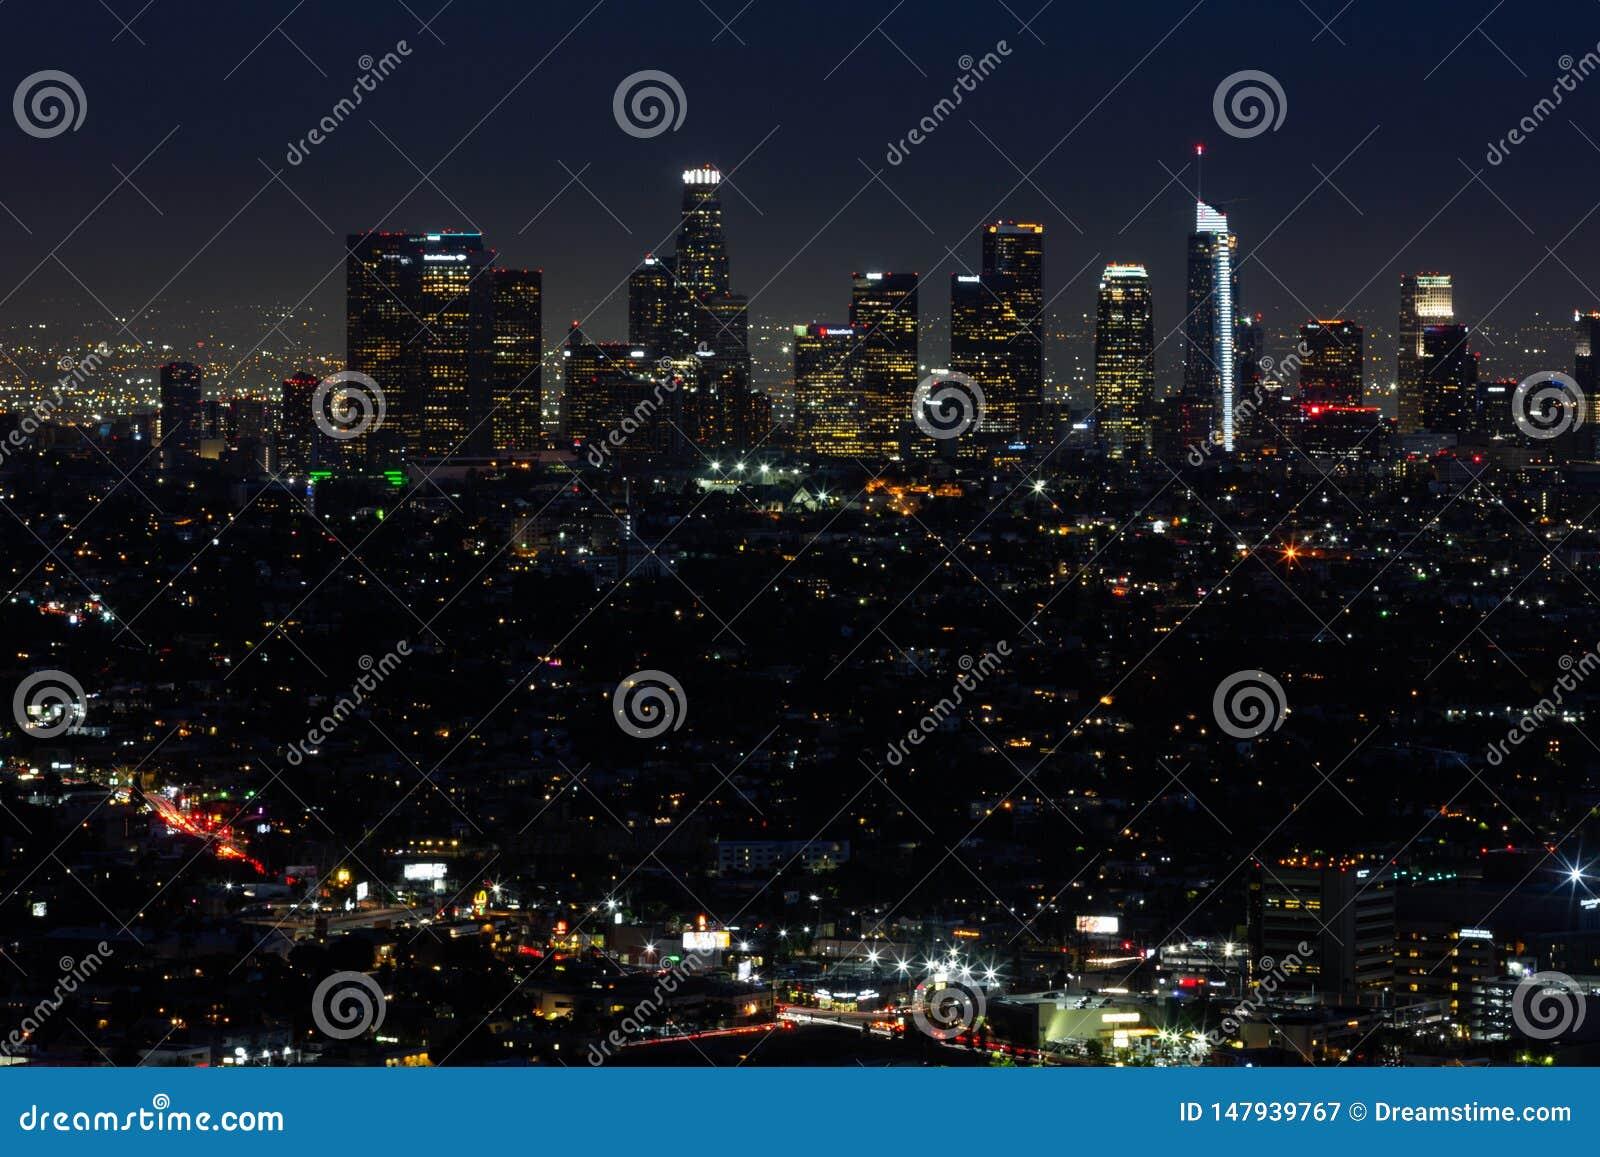 La-horizon bij nacht